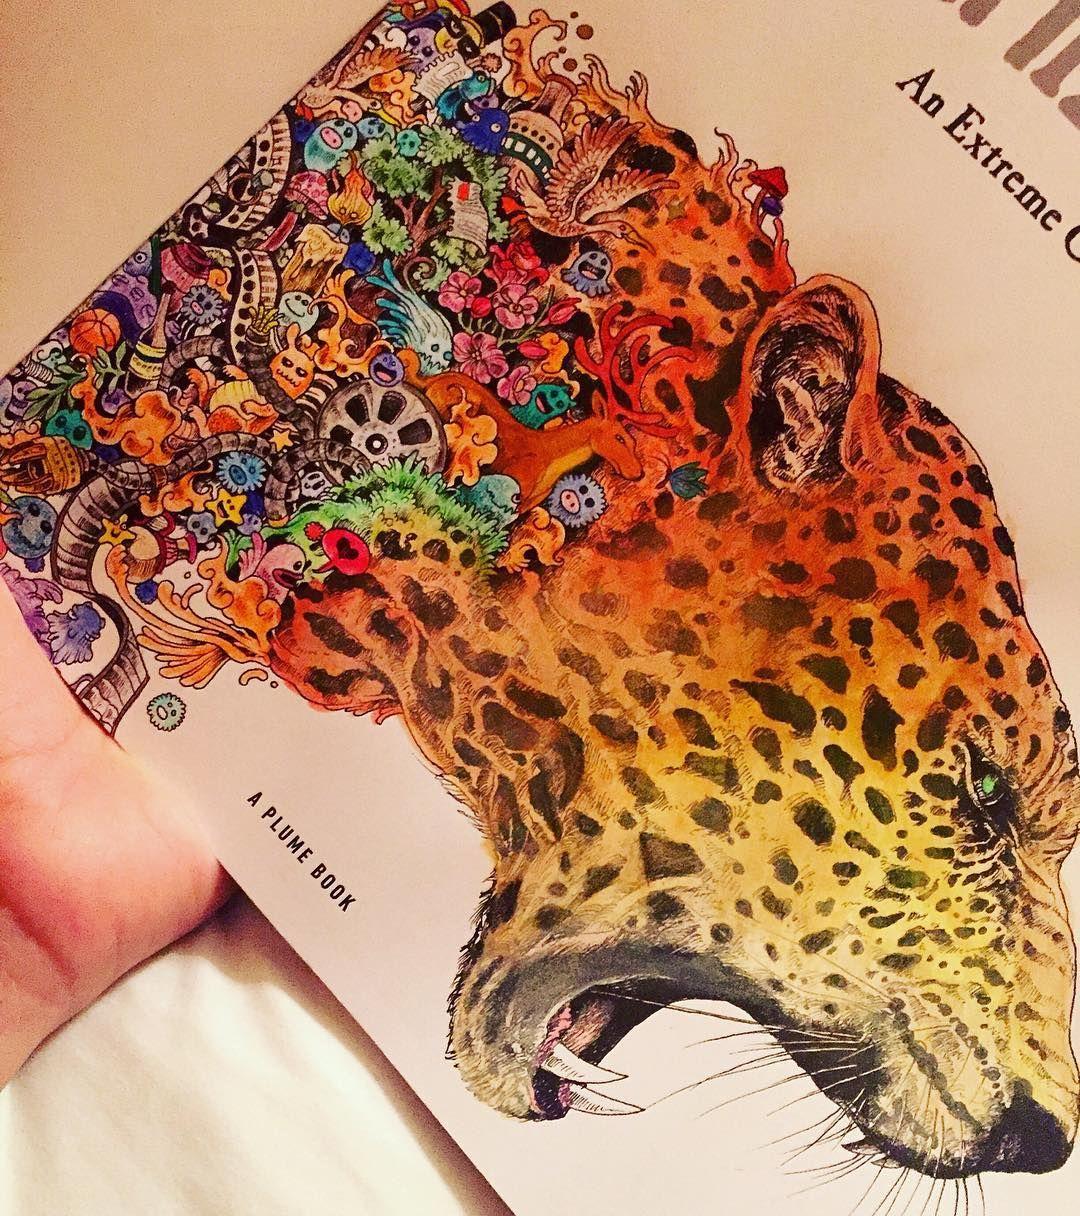 Animorphia Adultcoloring Adultcoloringbook Adultcolouringbooks